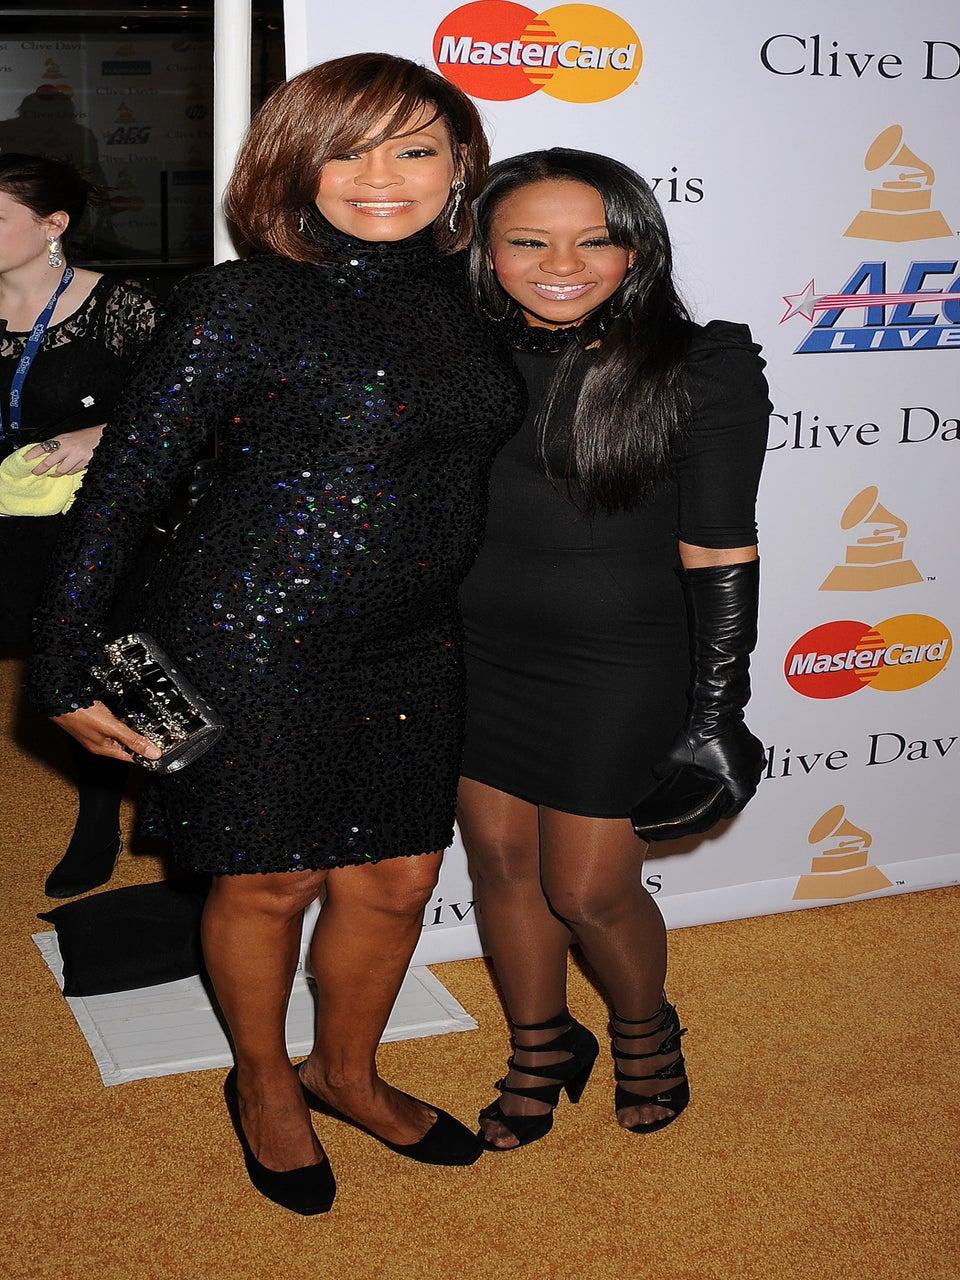 Will Bobbi Kristina Honor Whitney at the Billboard Awards?